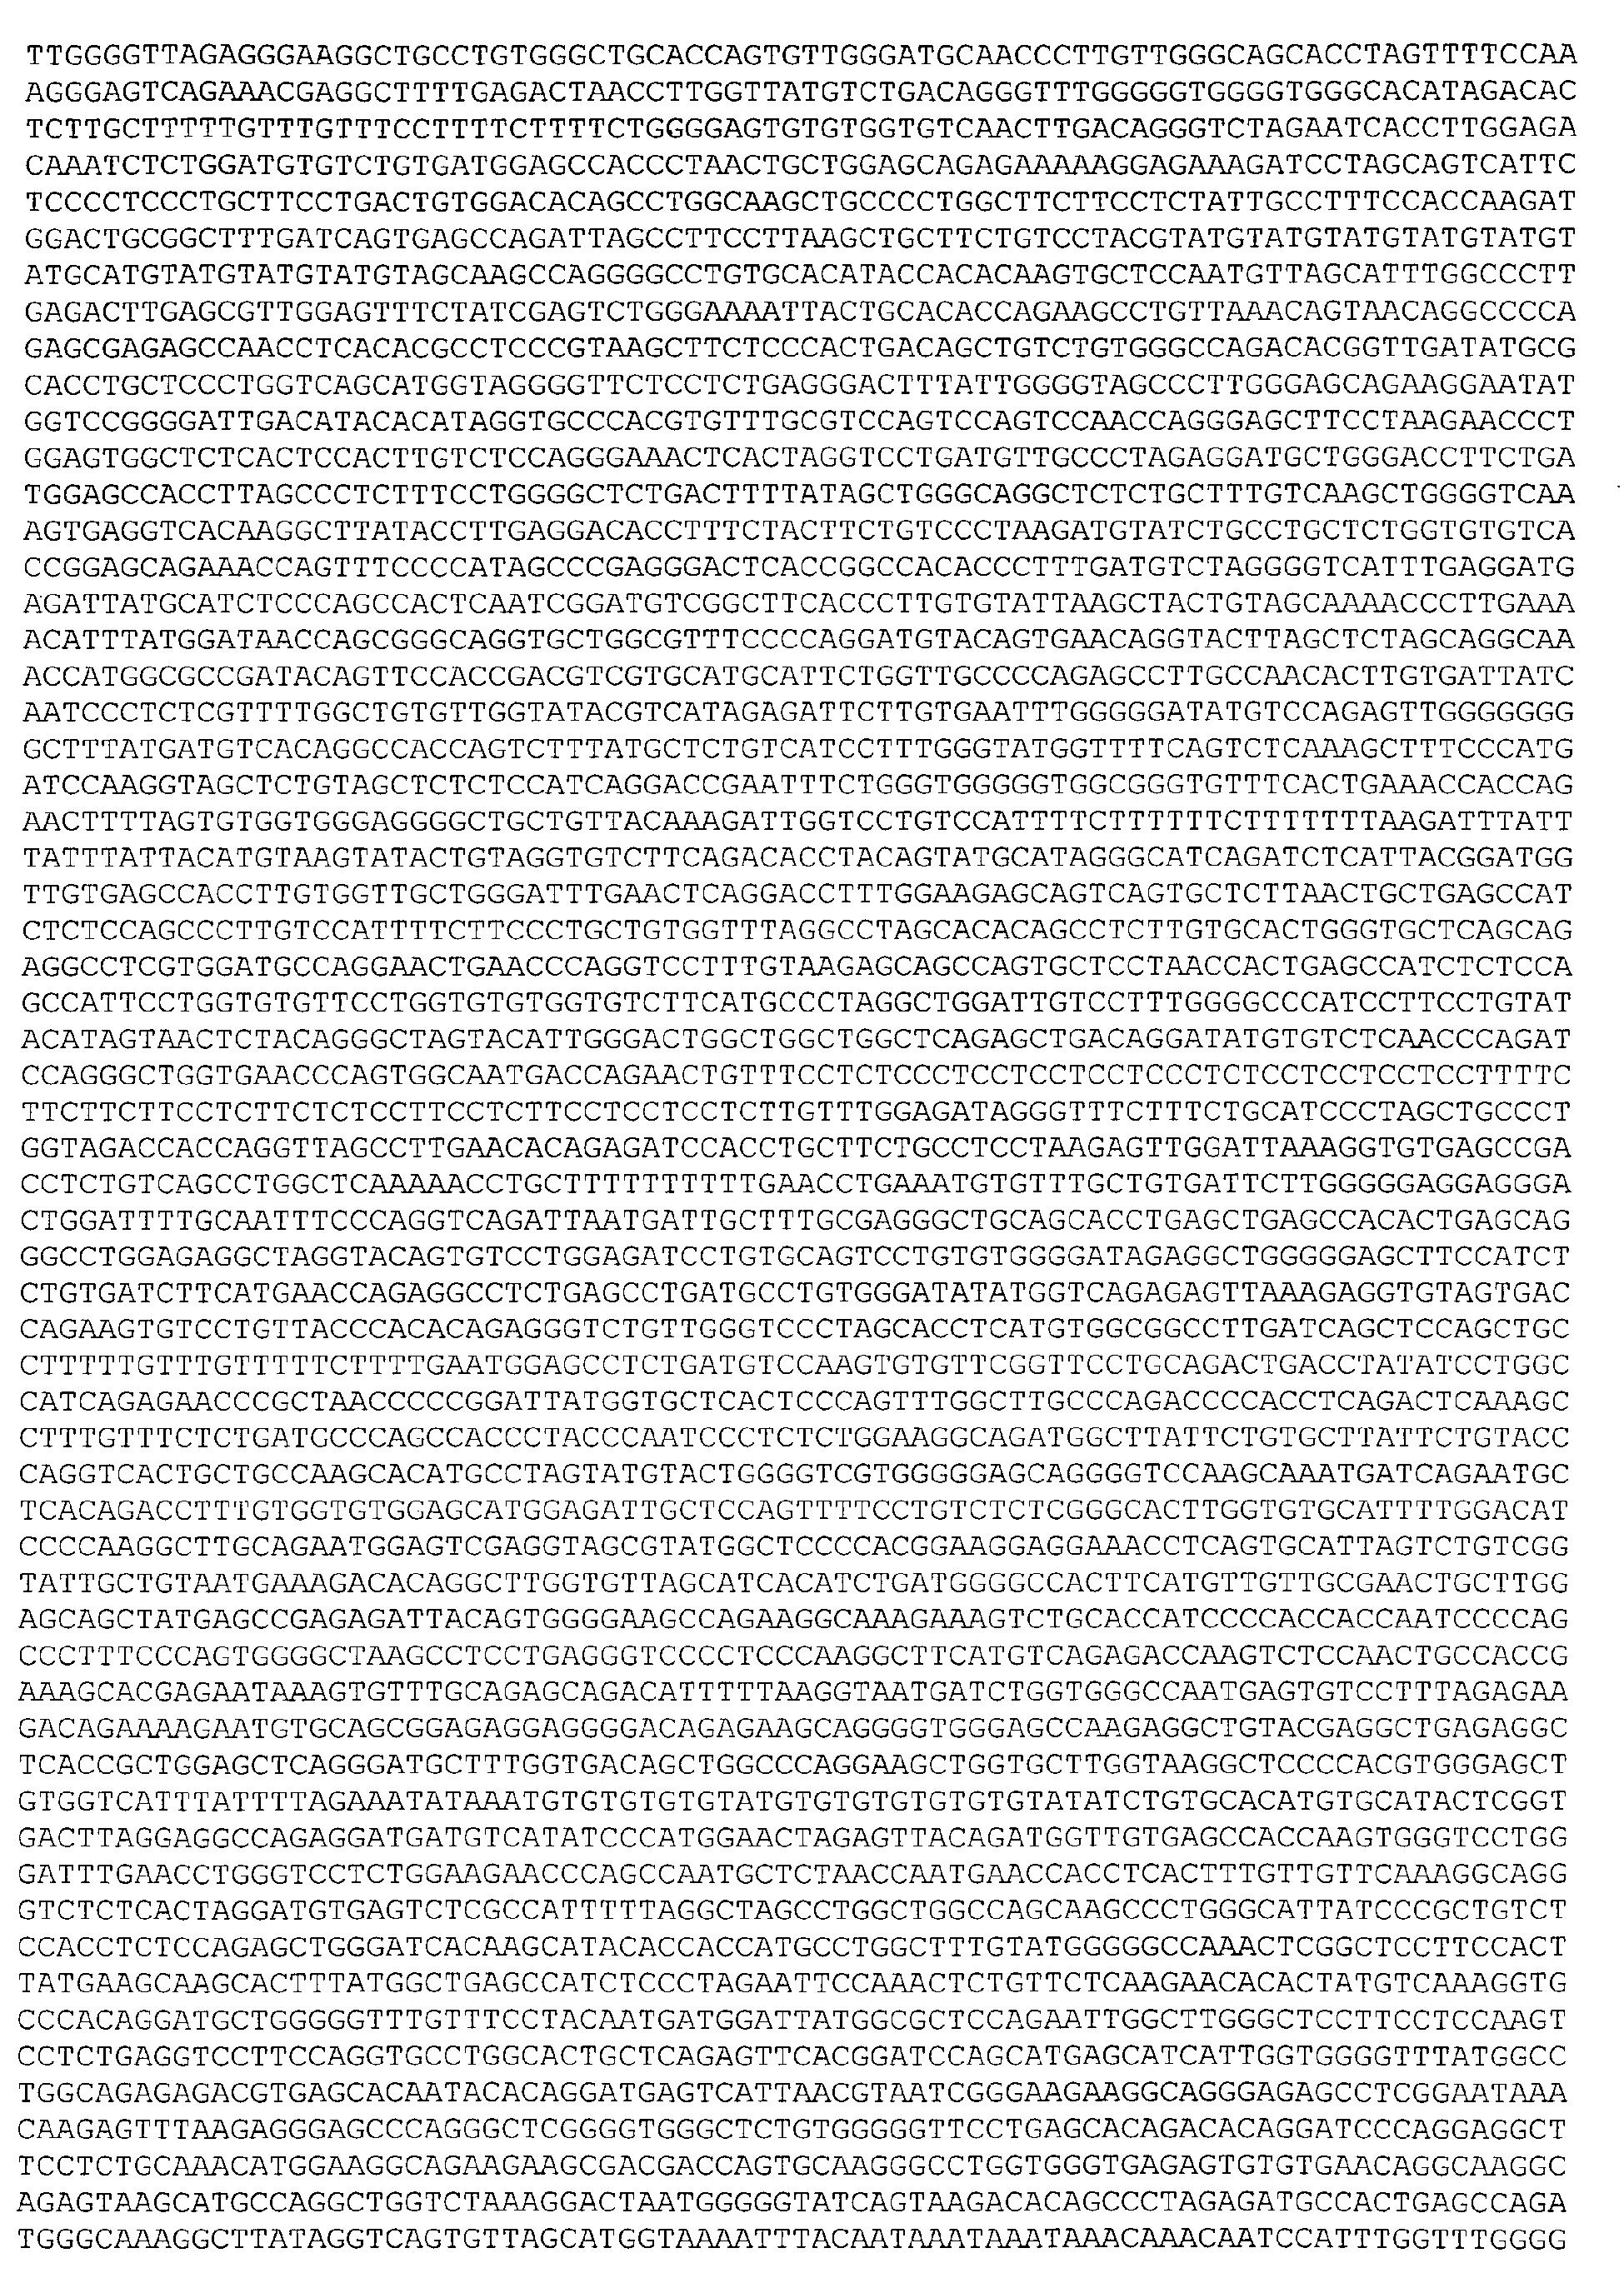 Figure imgb0241